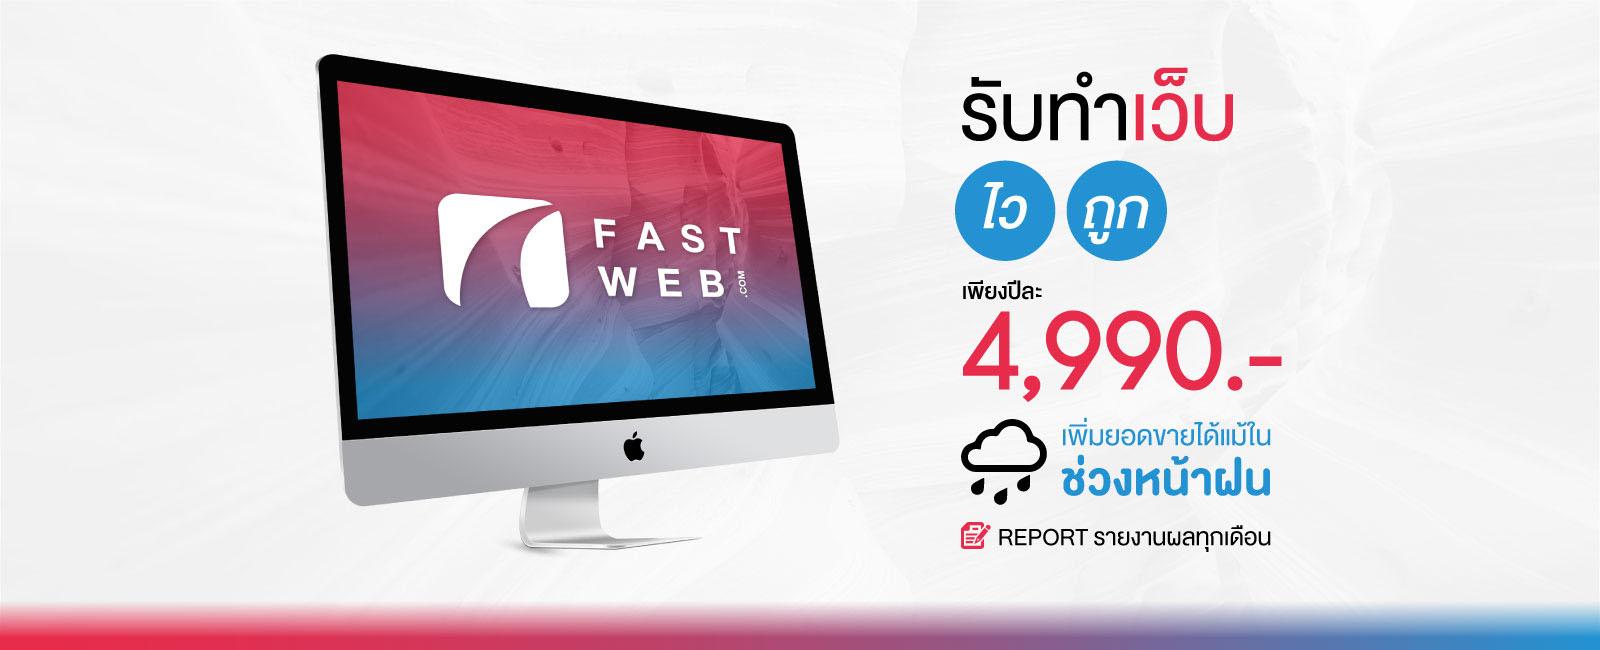 Fastweb เว็บไซต์พร้อมใช้สร้างเสร็จภายใน 3 วัน ในราคา 4,990 บาท เท่านั้น!